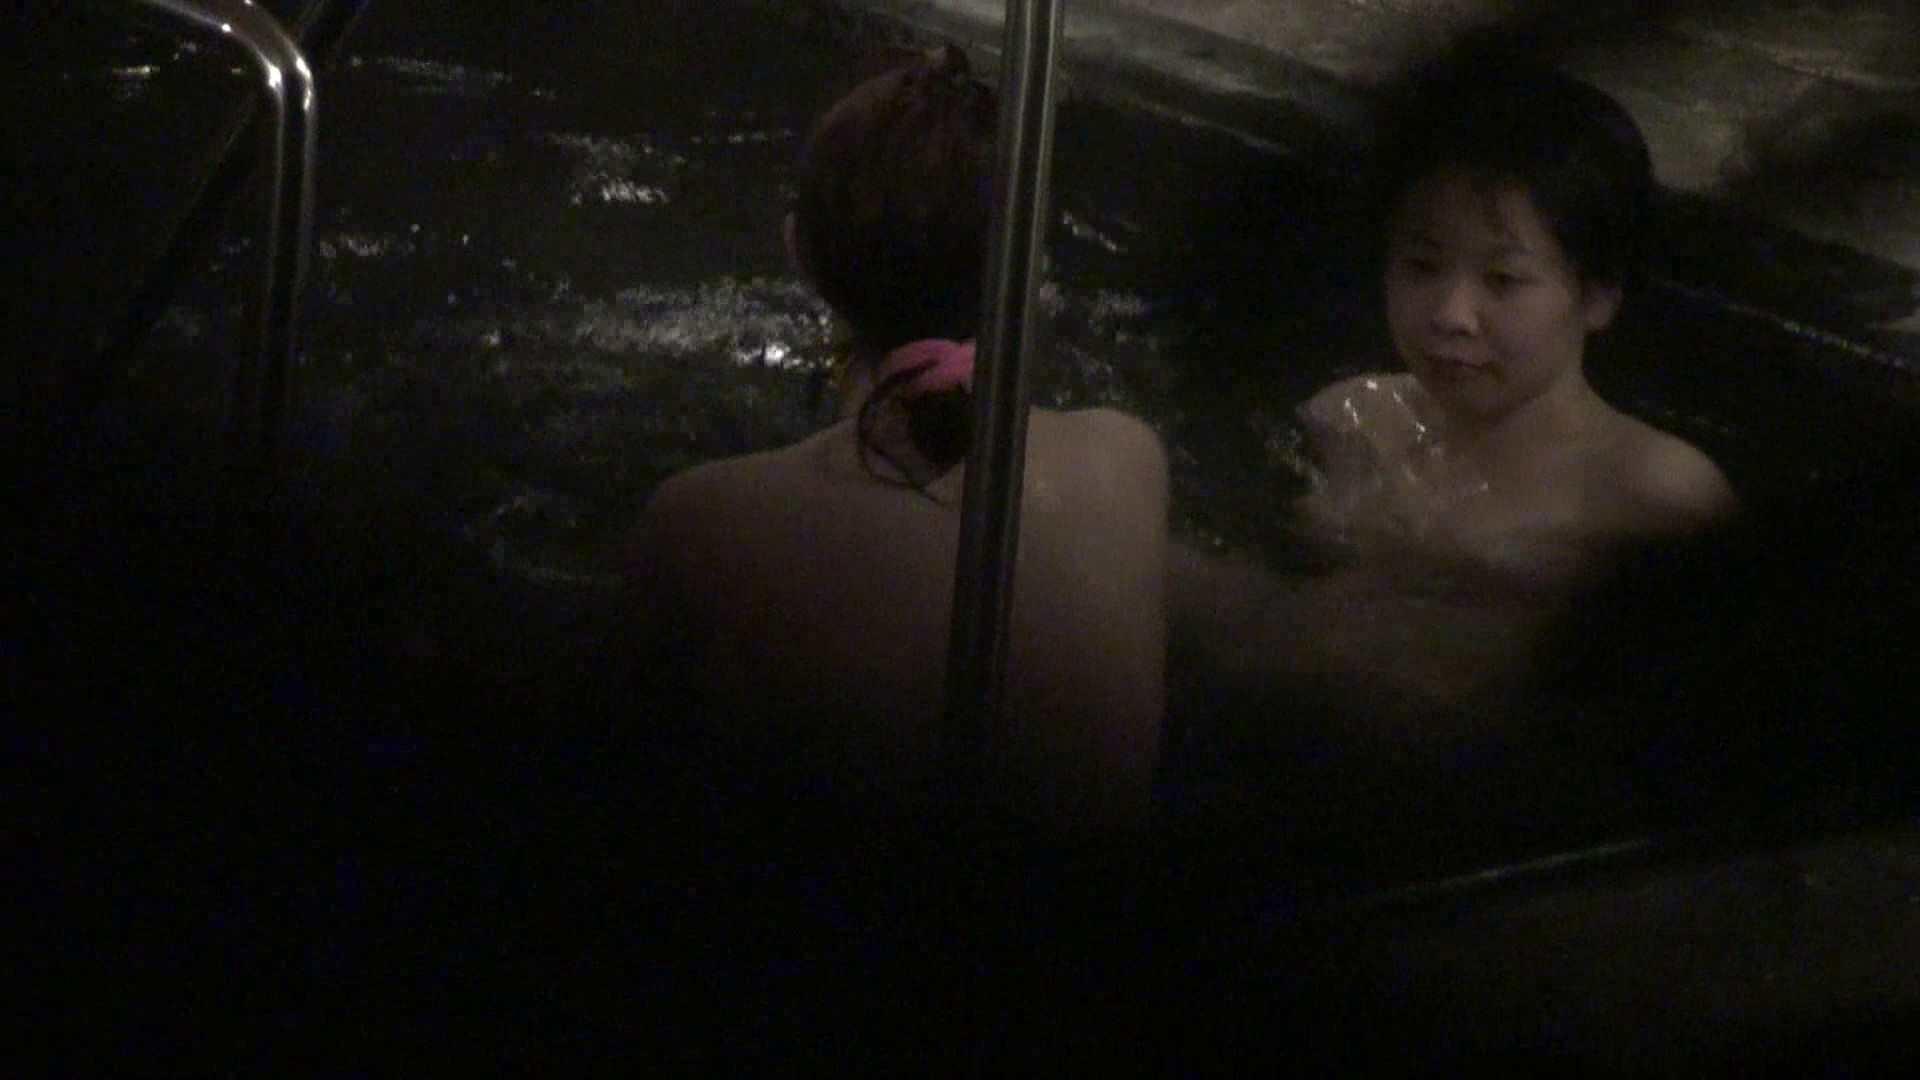 Aquaな露天風呂Vol.394 盗撮 | OLセックス  99画像 76